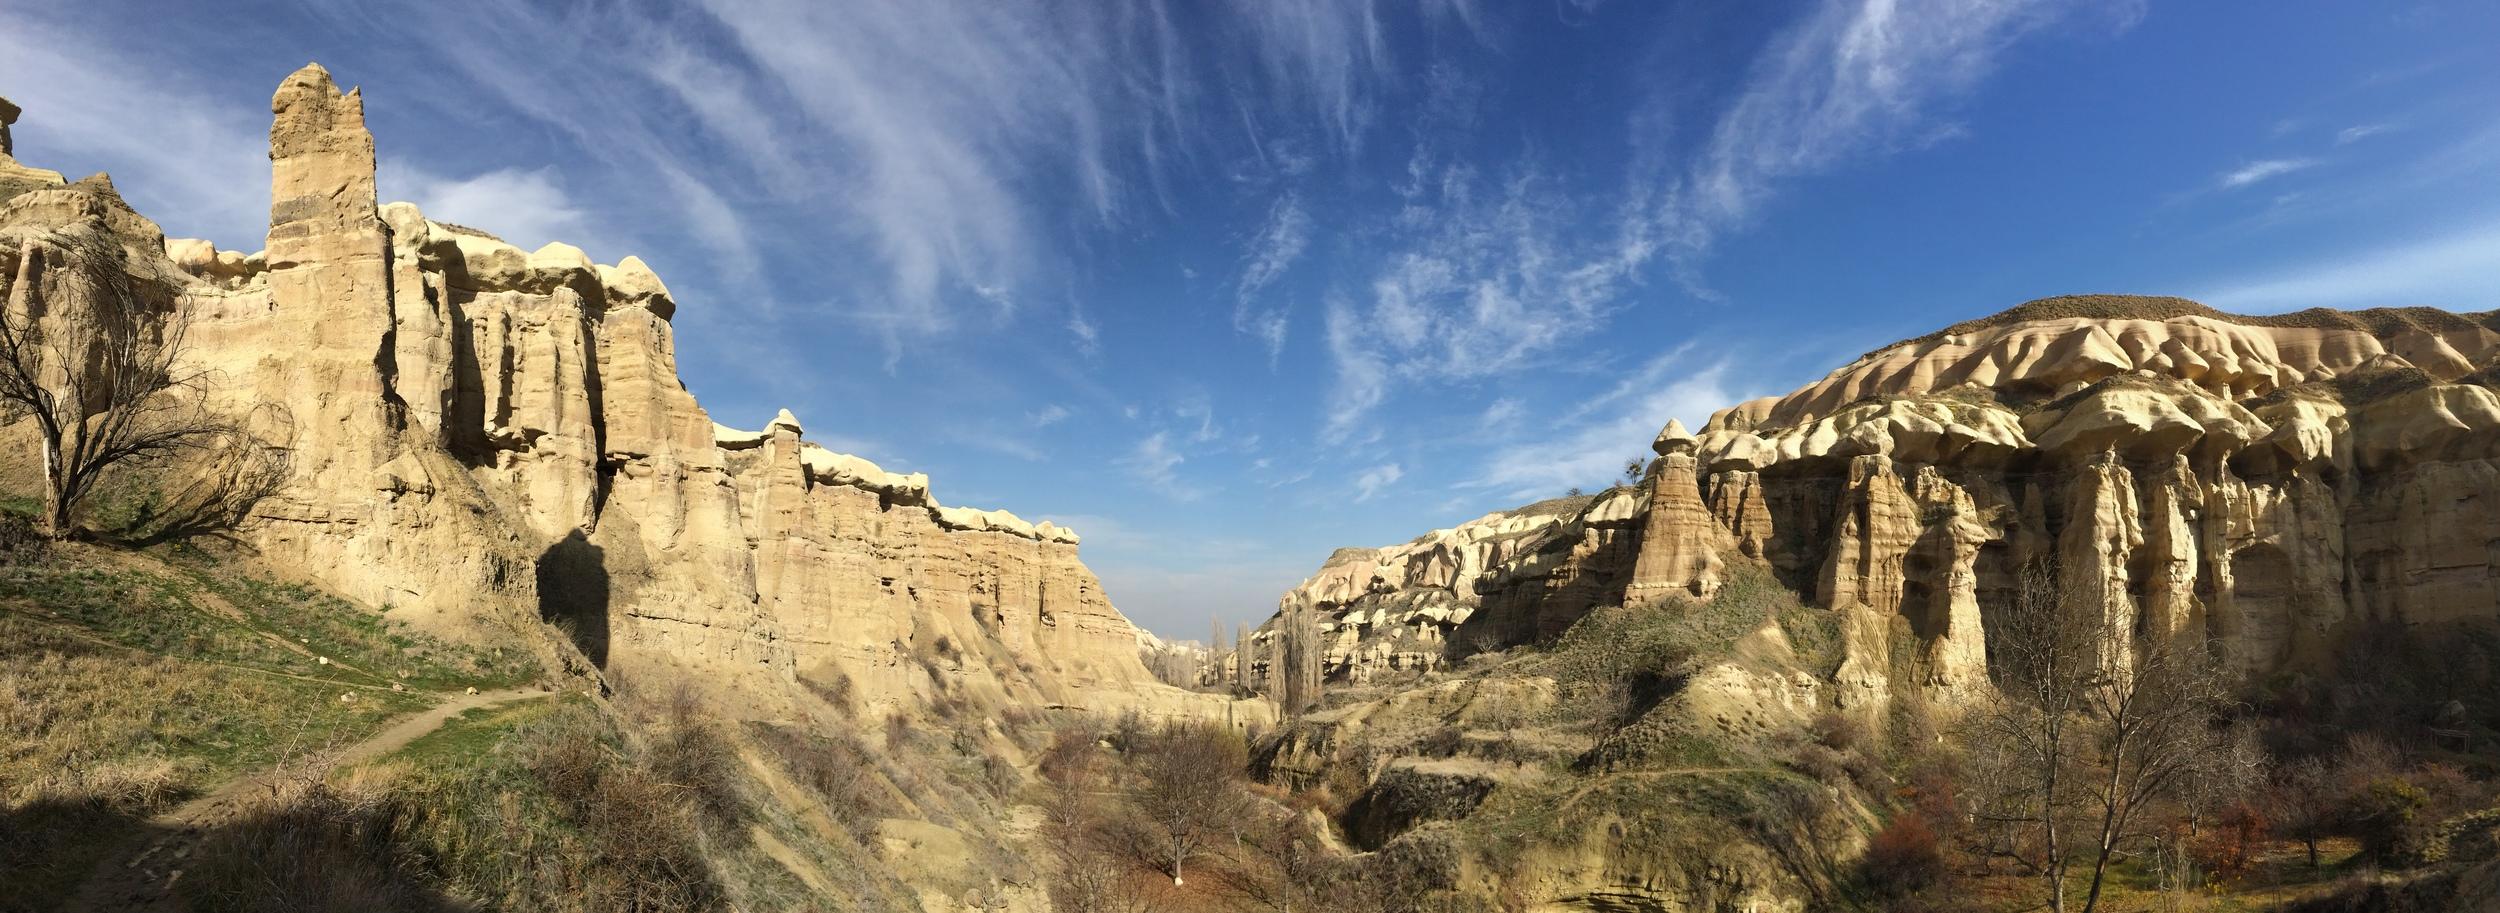 Panoramic shot of the valley during my hike to Uchisar.